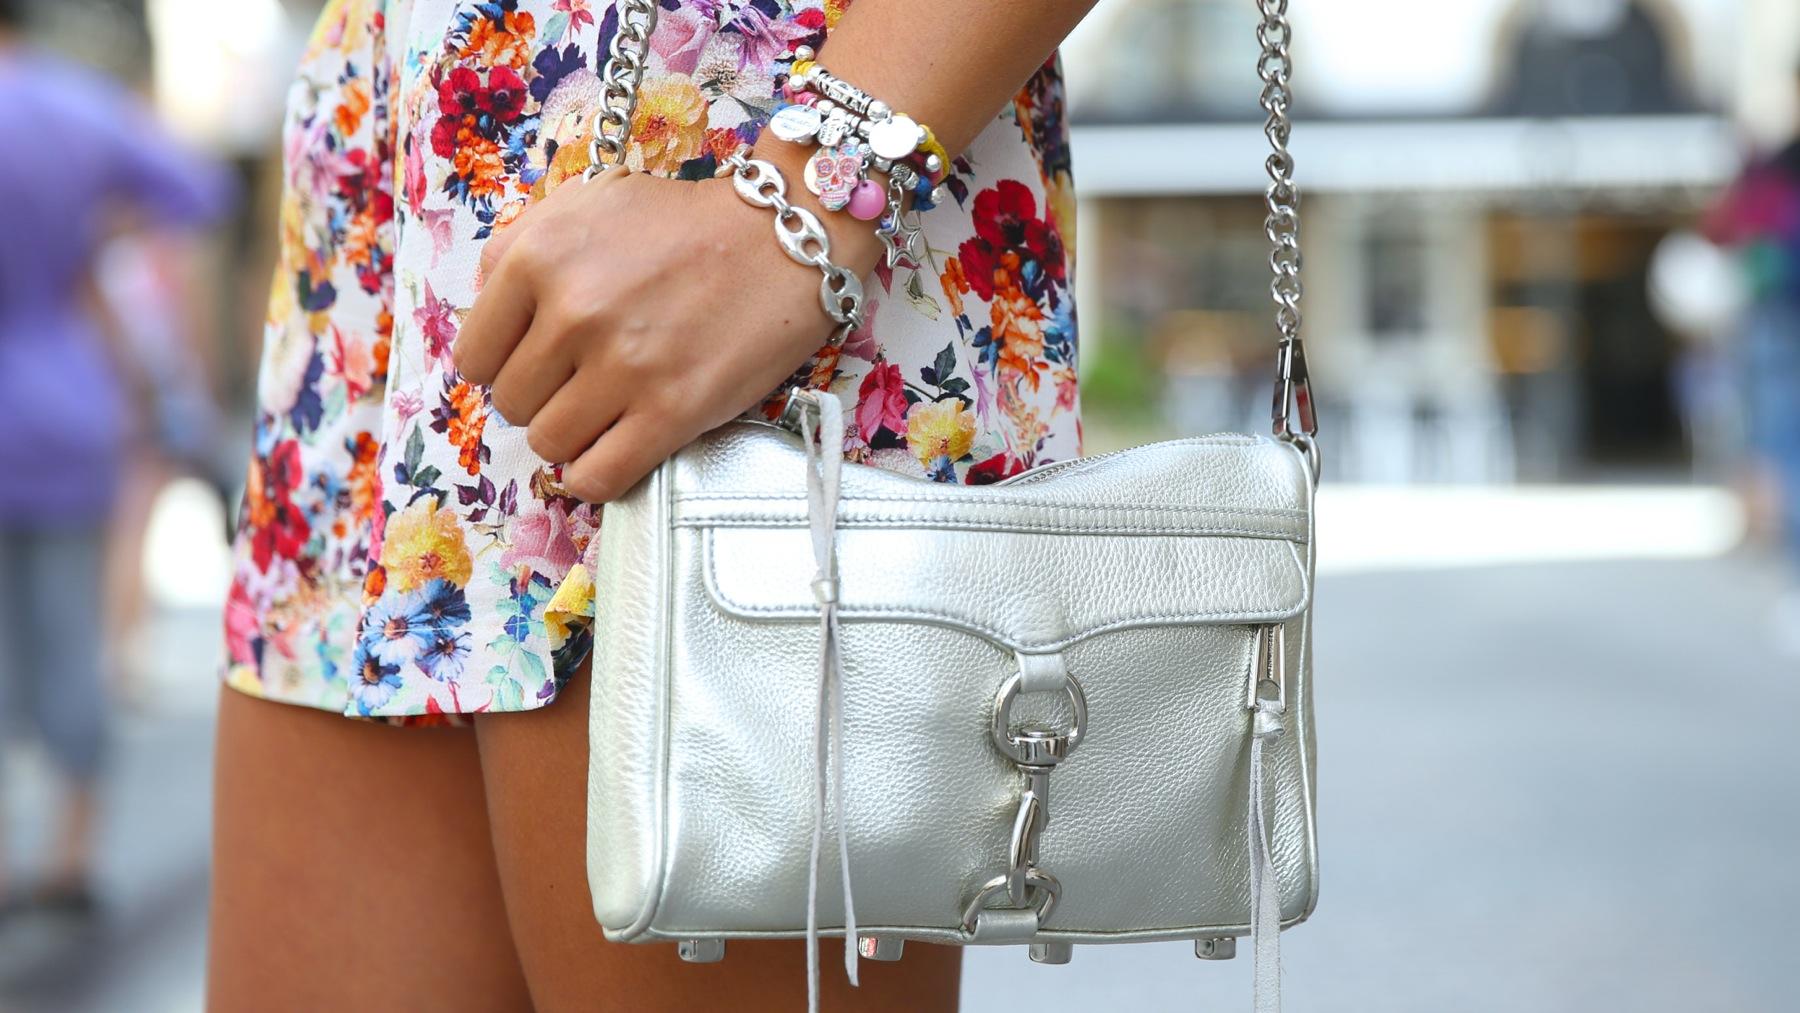 trendy_taste-look-outfit-street_style-ootd-blog-blogger-fashion_spain-moda_españa-mono-flores-flower_print-verano-summer-overall-la_coruña-2